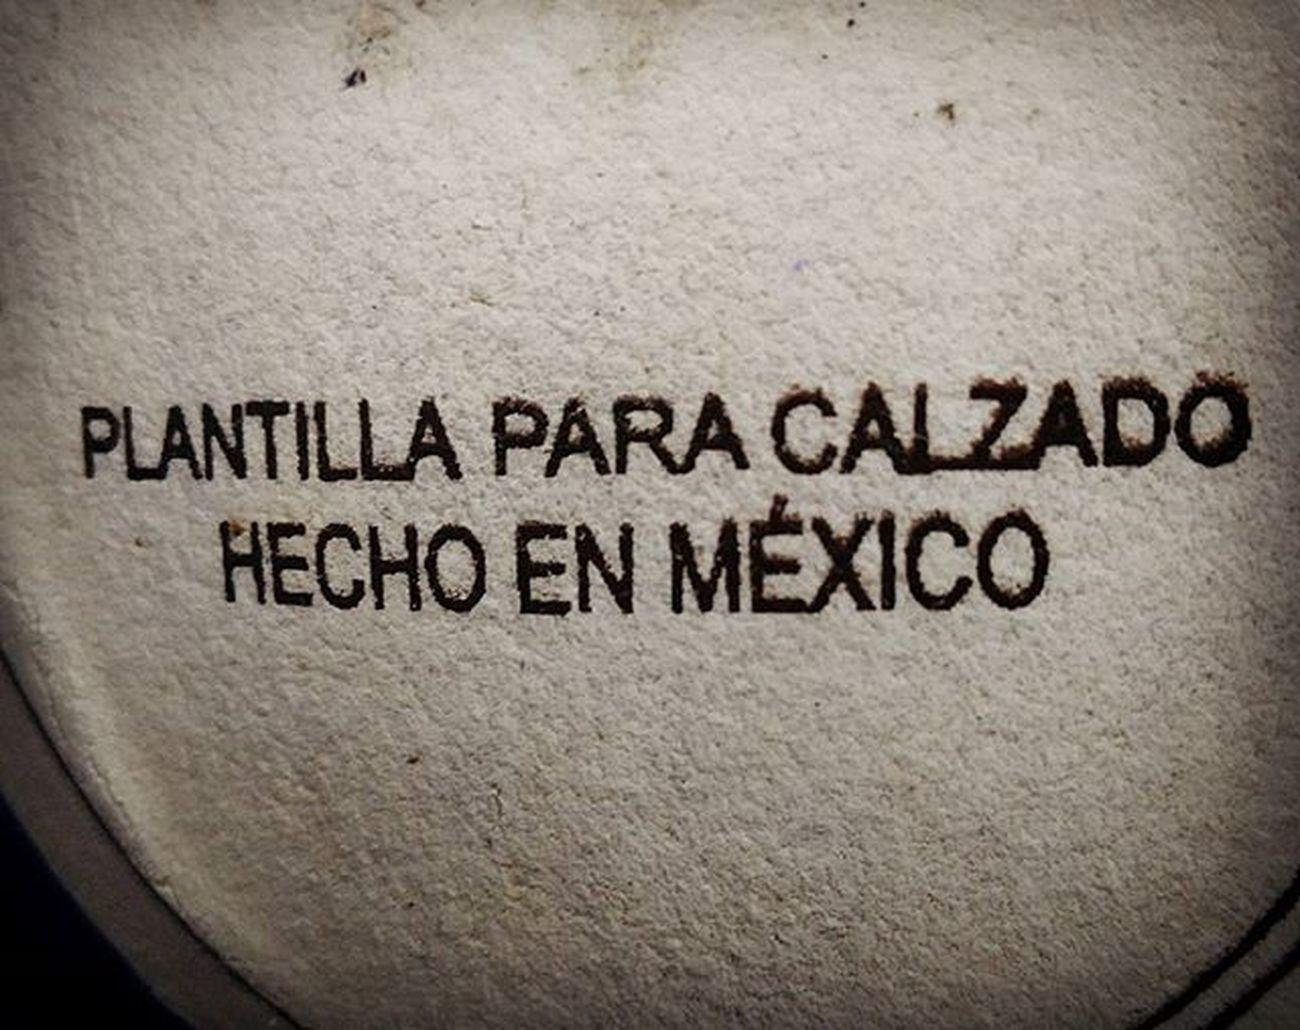 Lo siento zapatos importados, estas plantillas son pa' puros mexicanos 😁 MadeInMexico Leather Grammar Syntax Gramatica Sintaxis